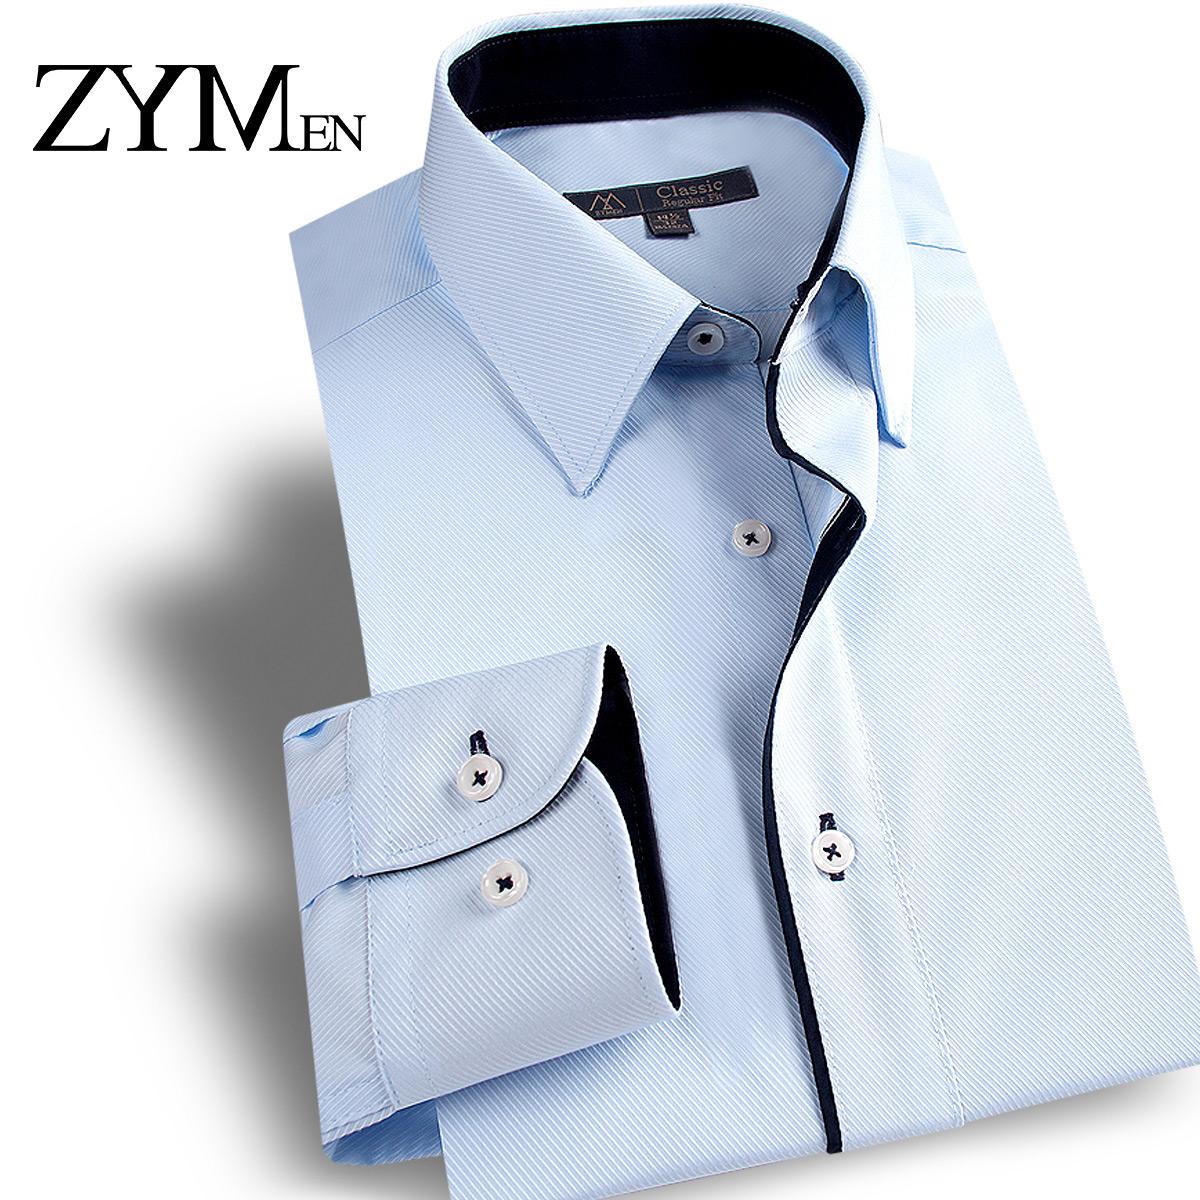 ZYMEN男士衬衫长袖秋季免烫修身韩版商务休闲正装伴郎纯色白衬衣